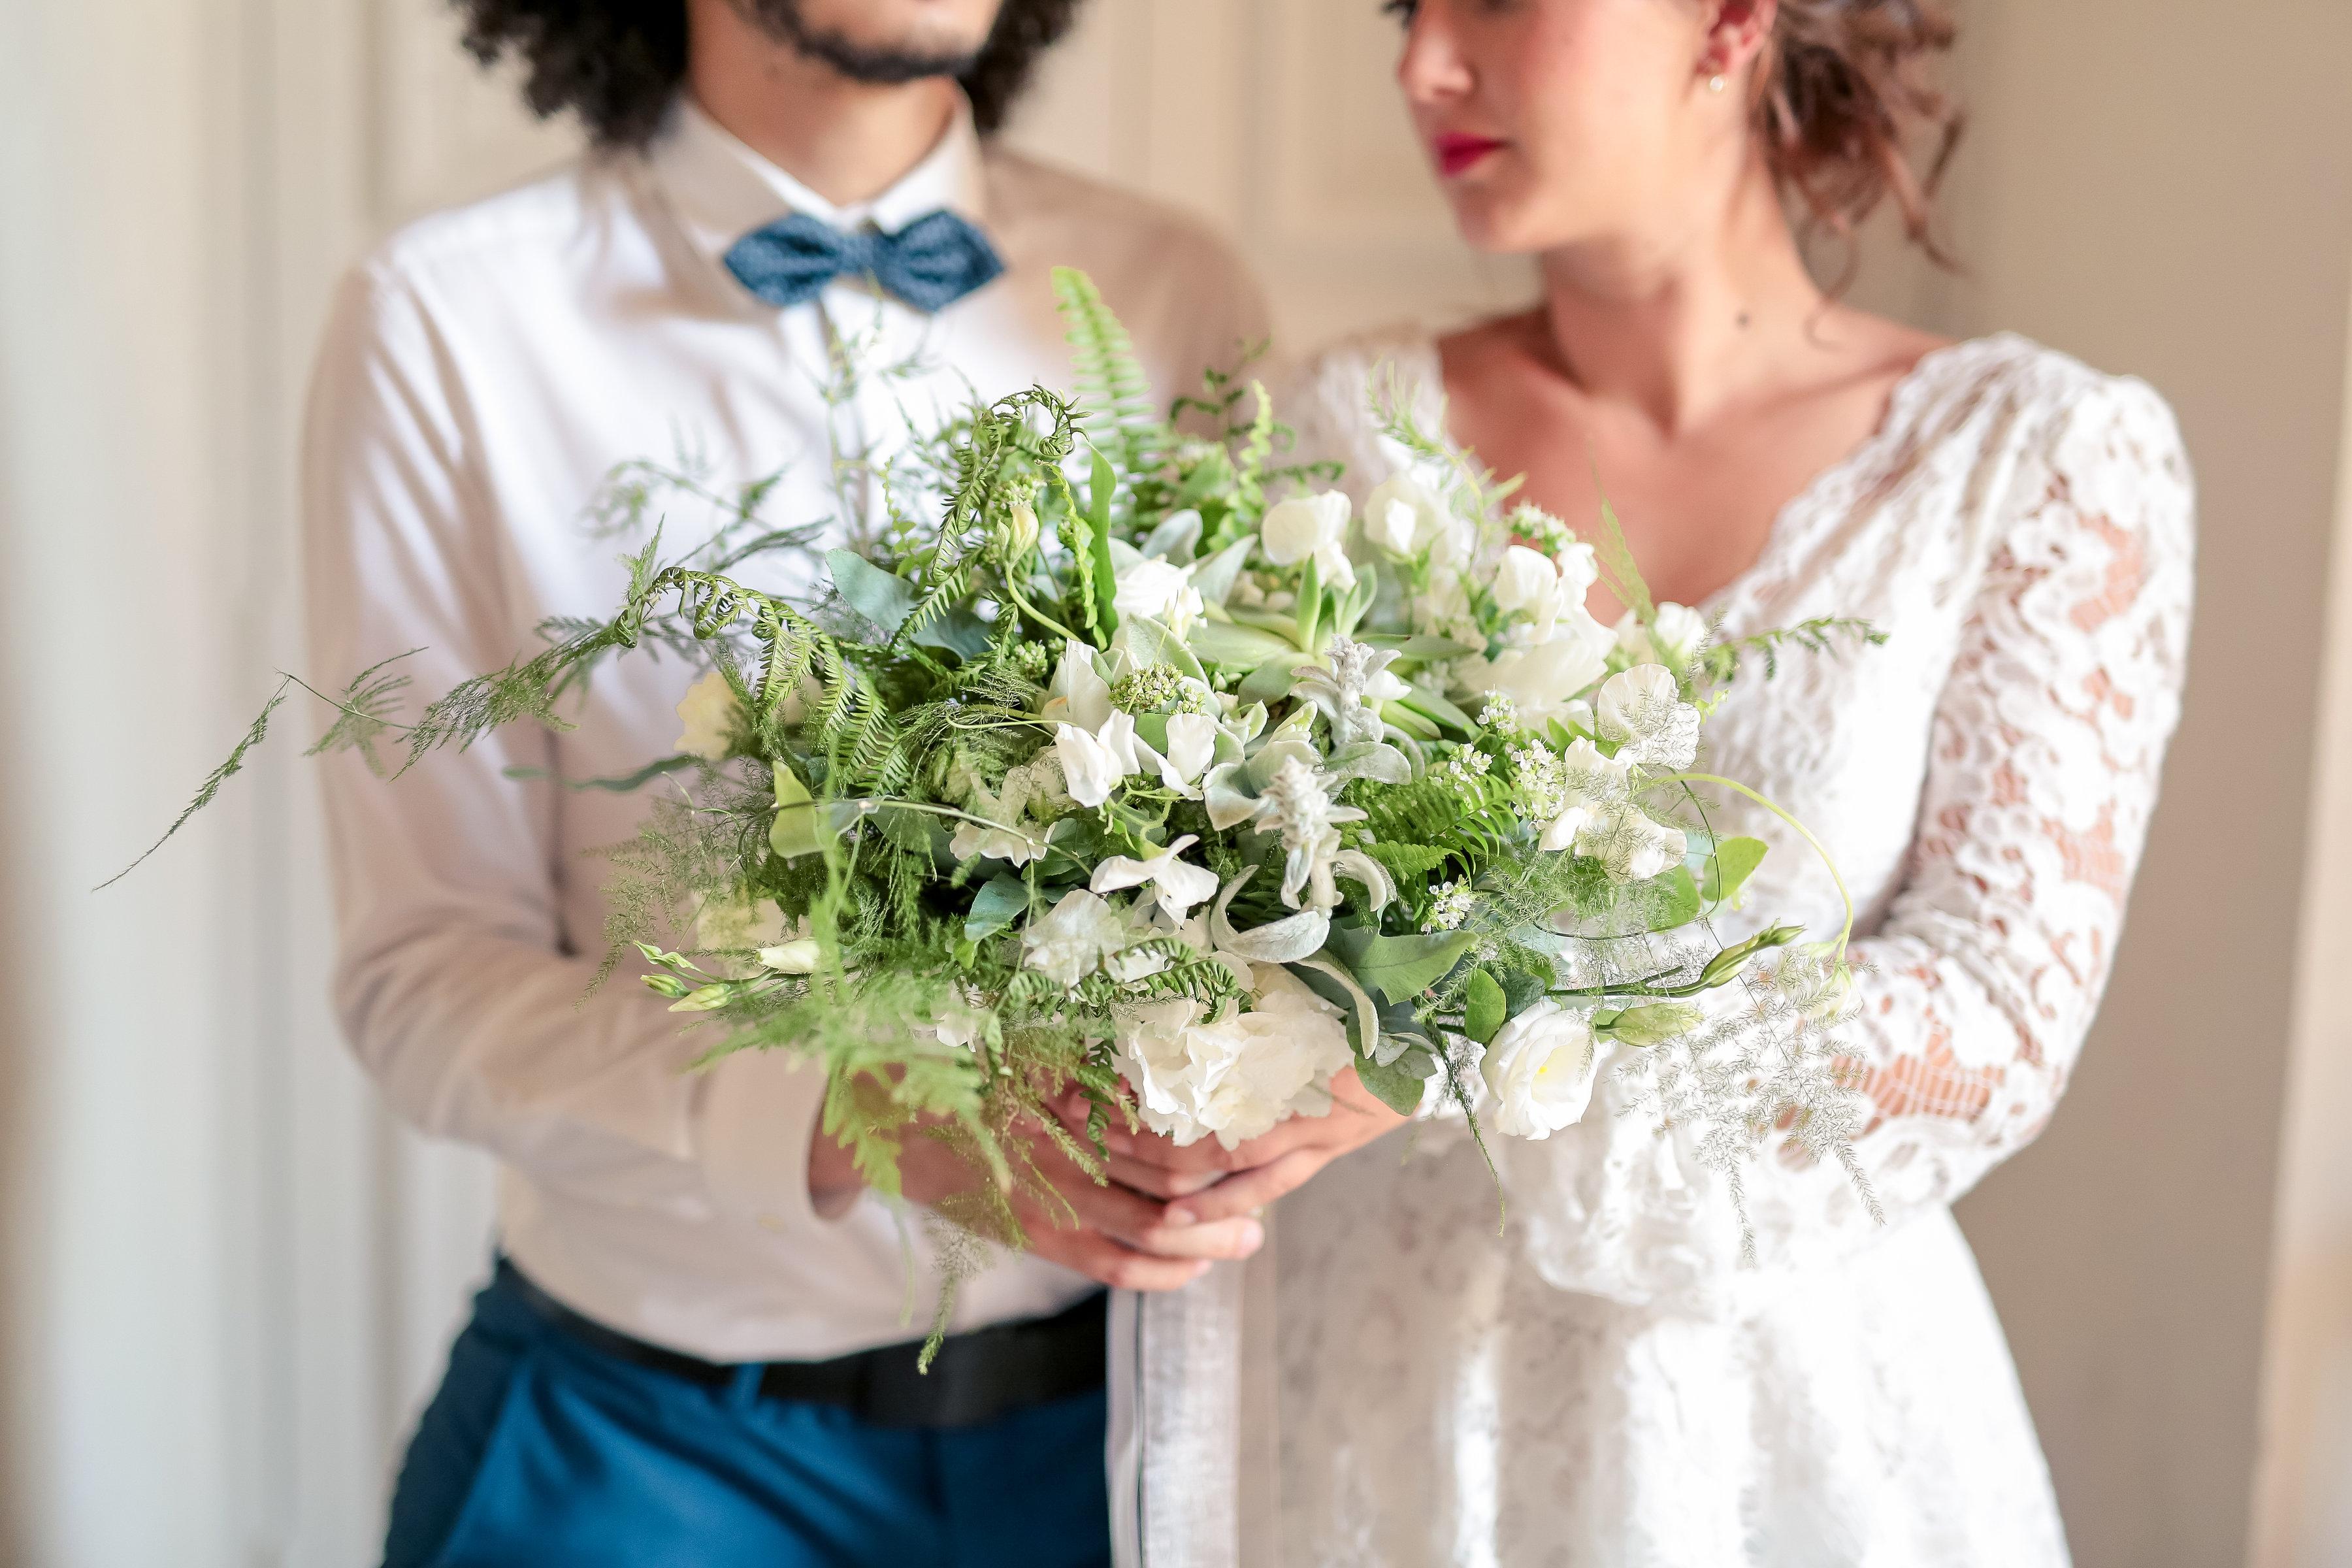 Couple mariage vegetal